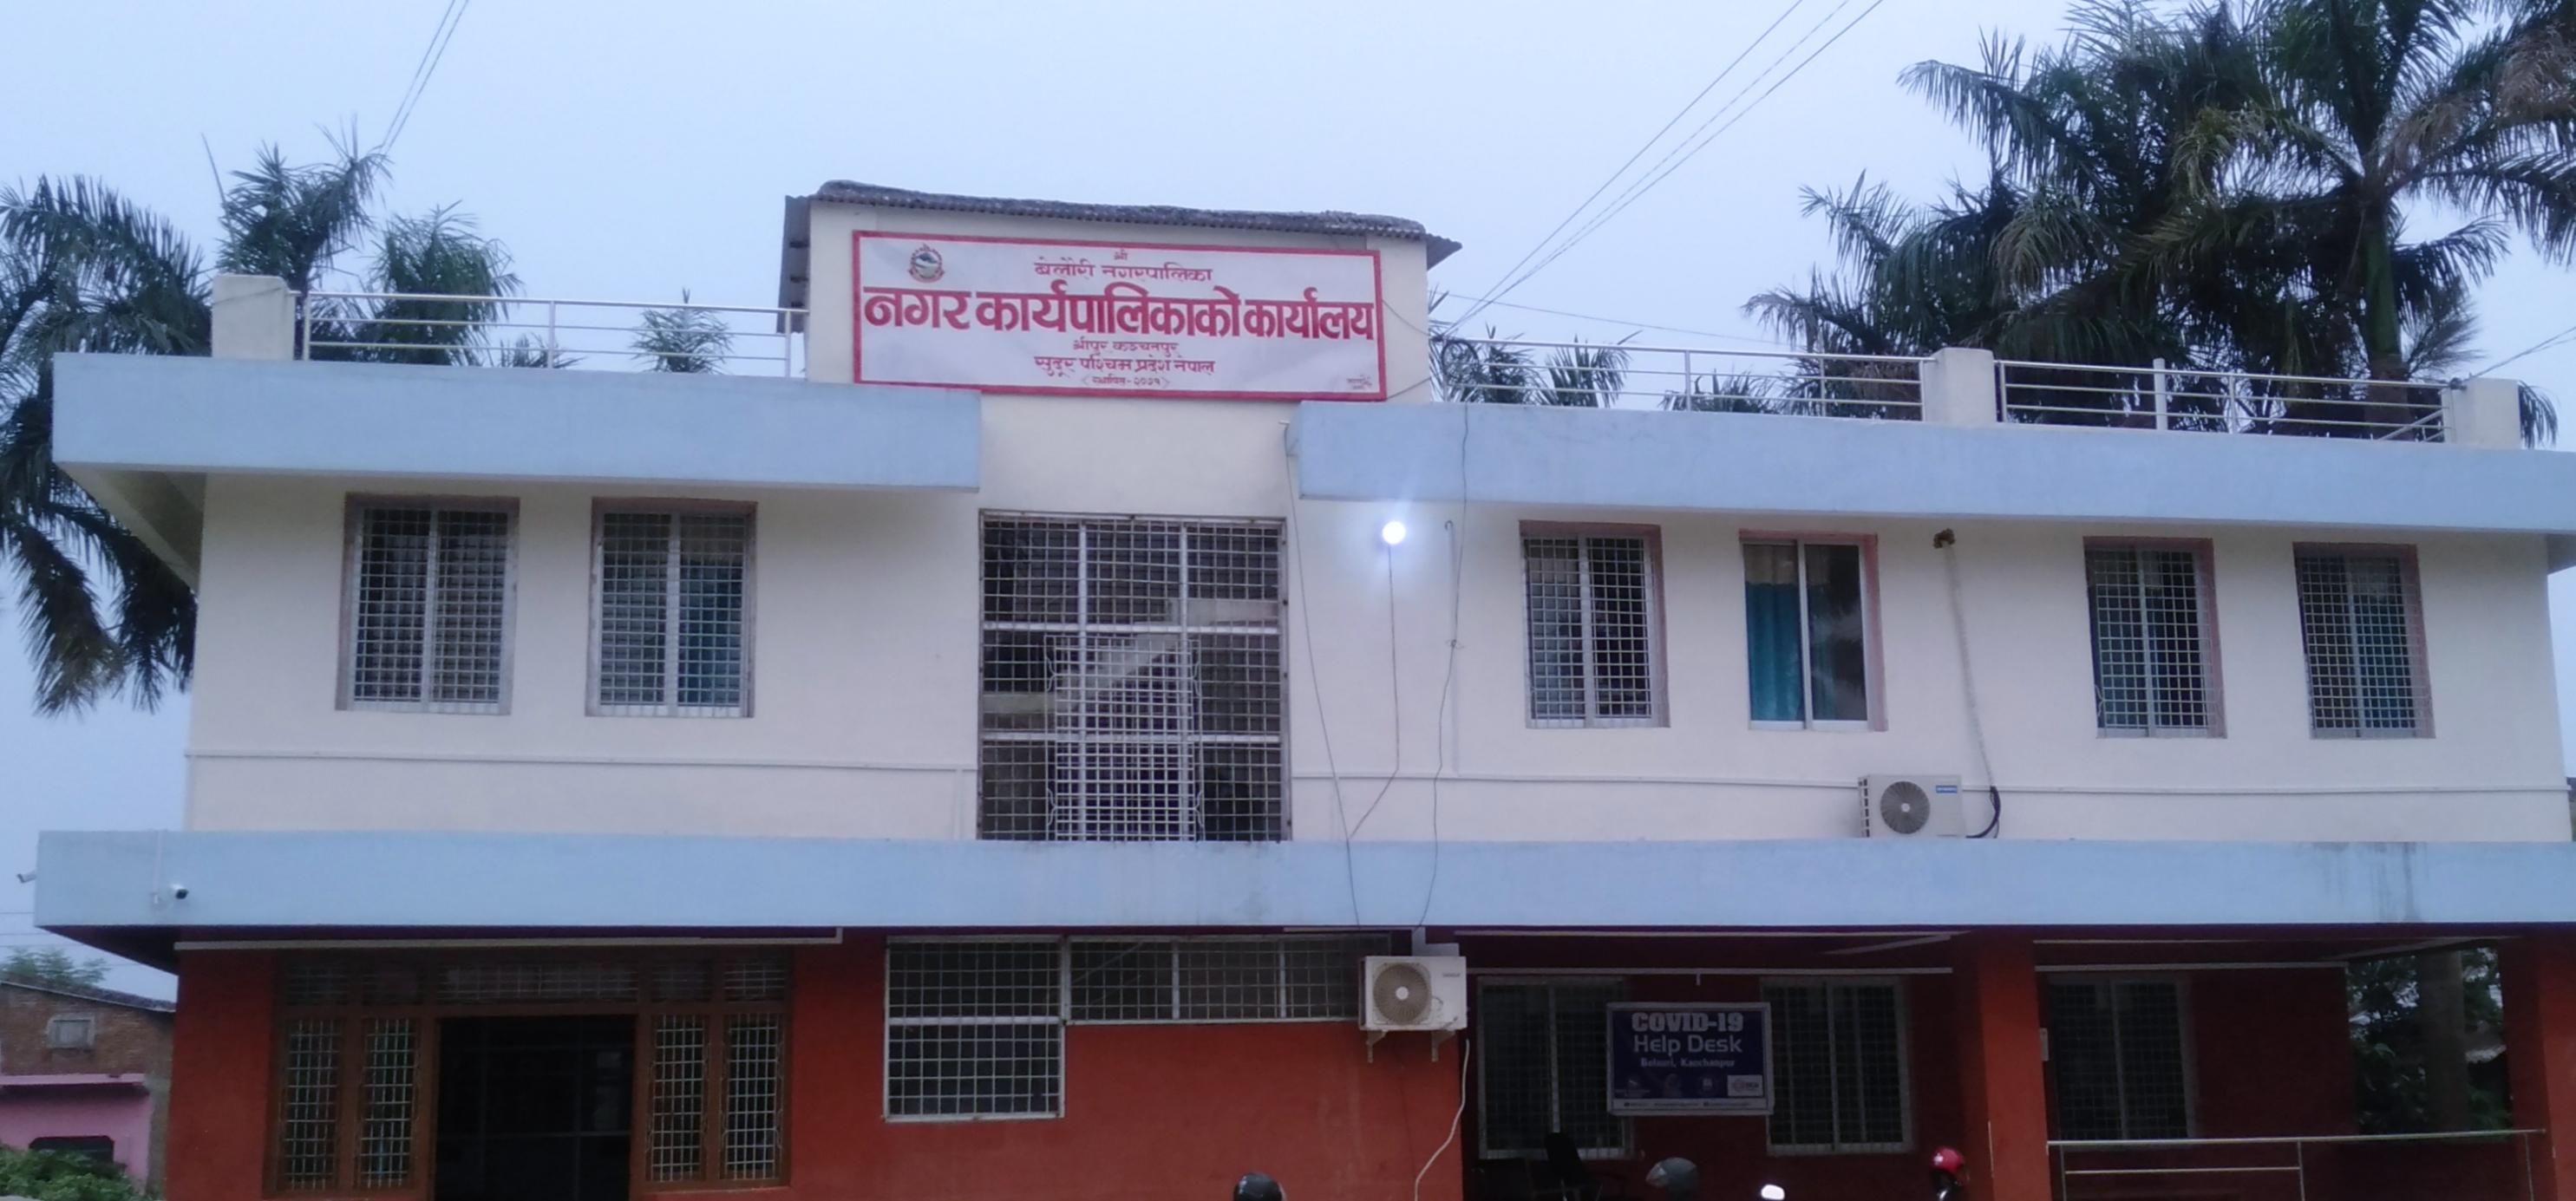 https://www.nepalbodh.com/social/education/3615